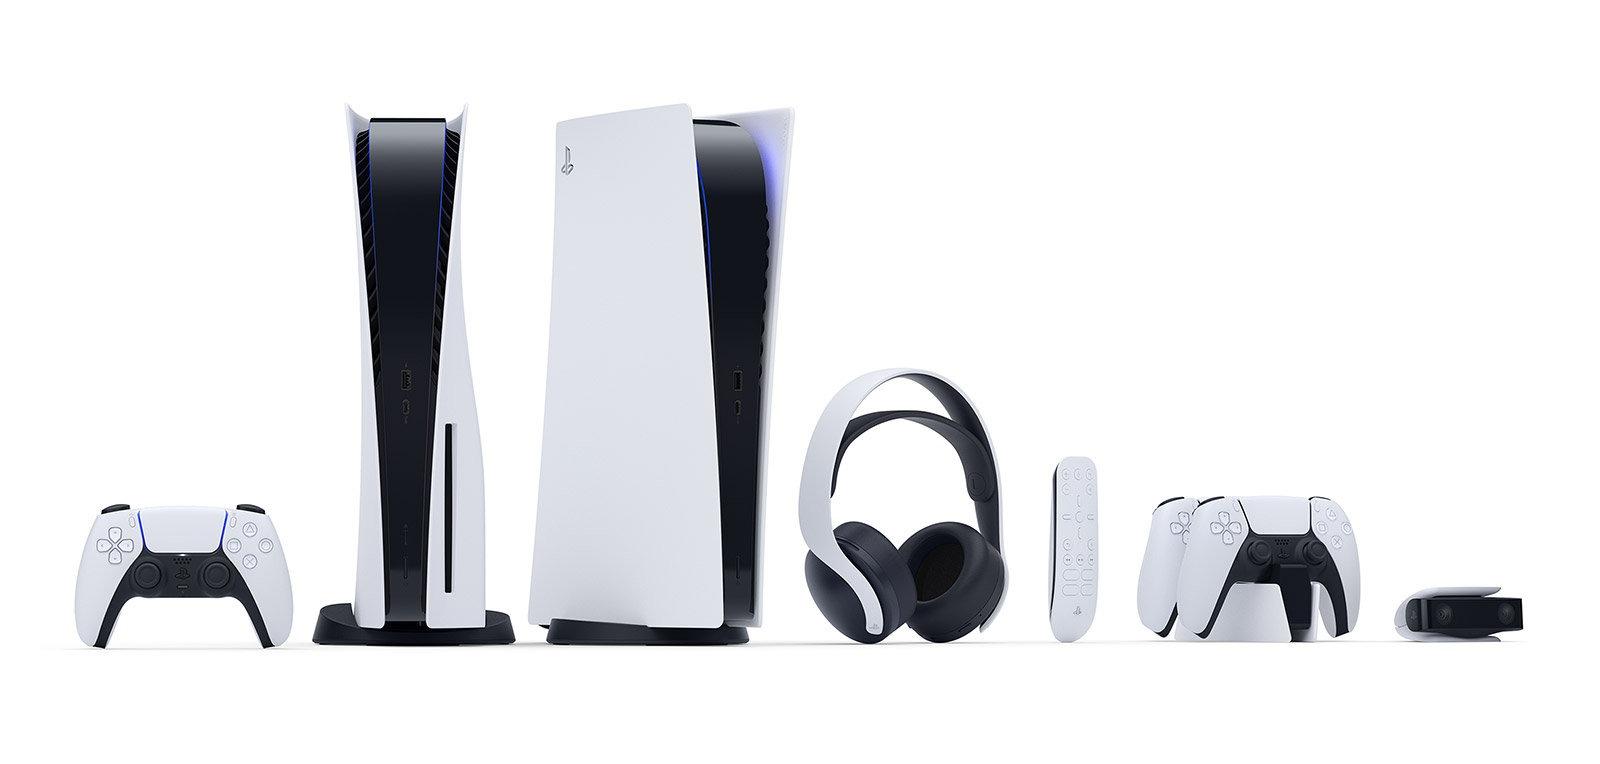 Next-Gen: PlayStation 5 (PS5)